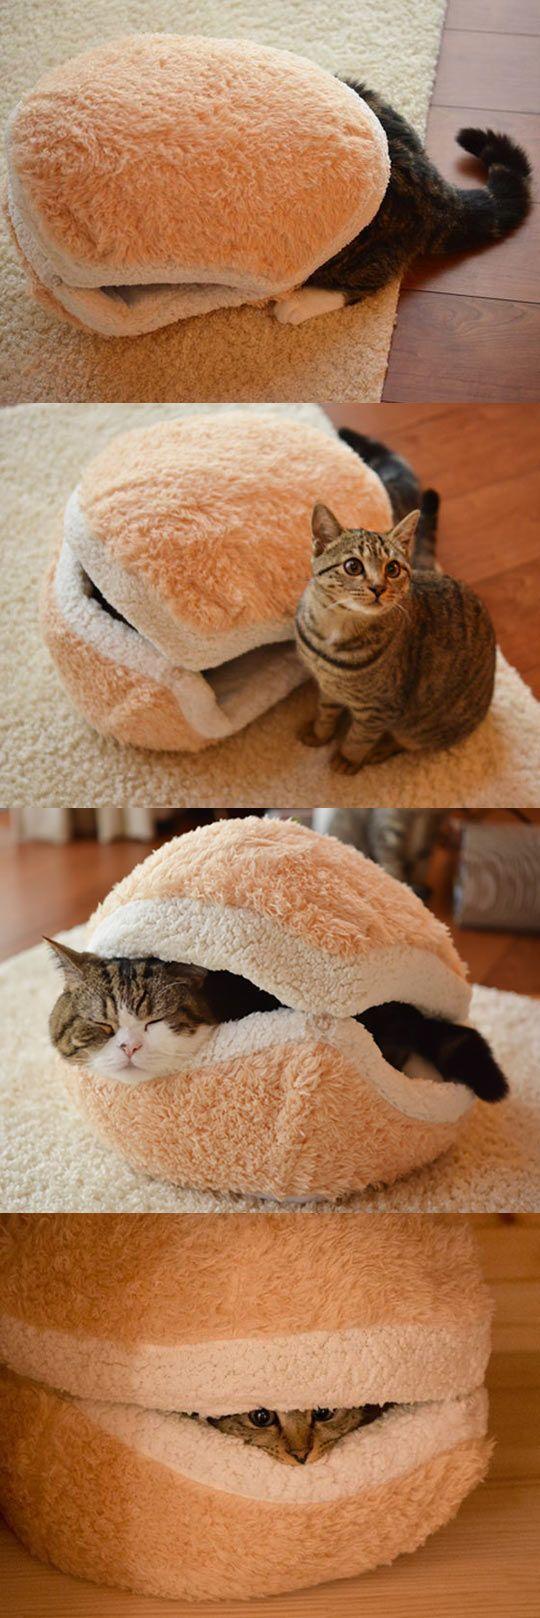 Cat sammich.